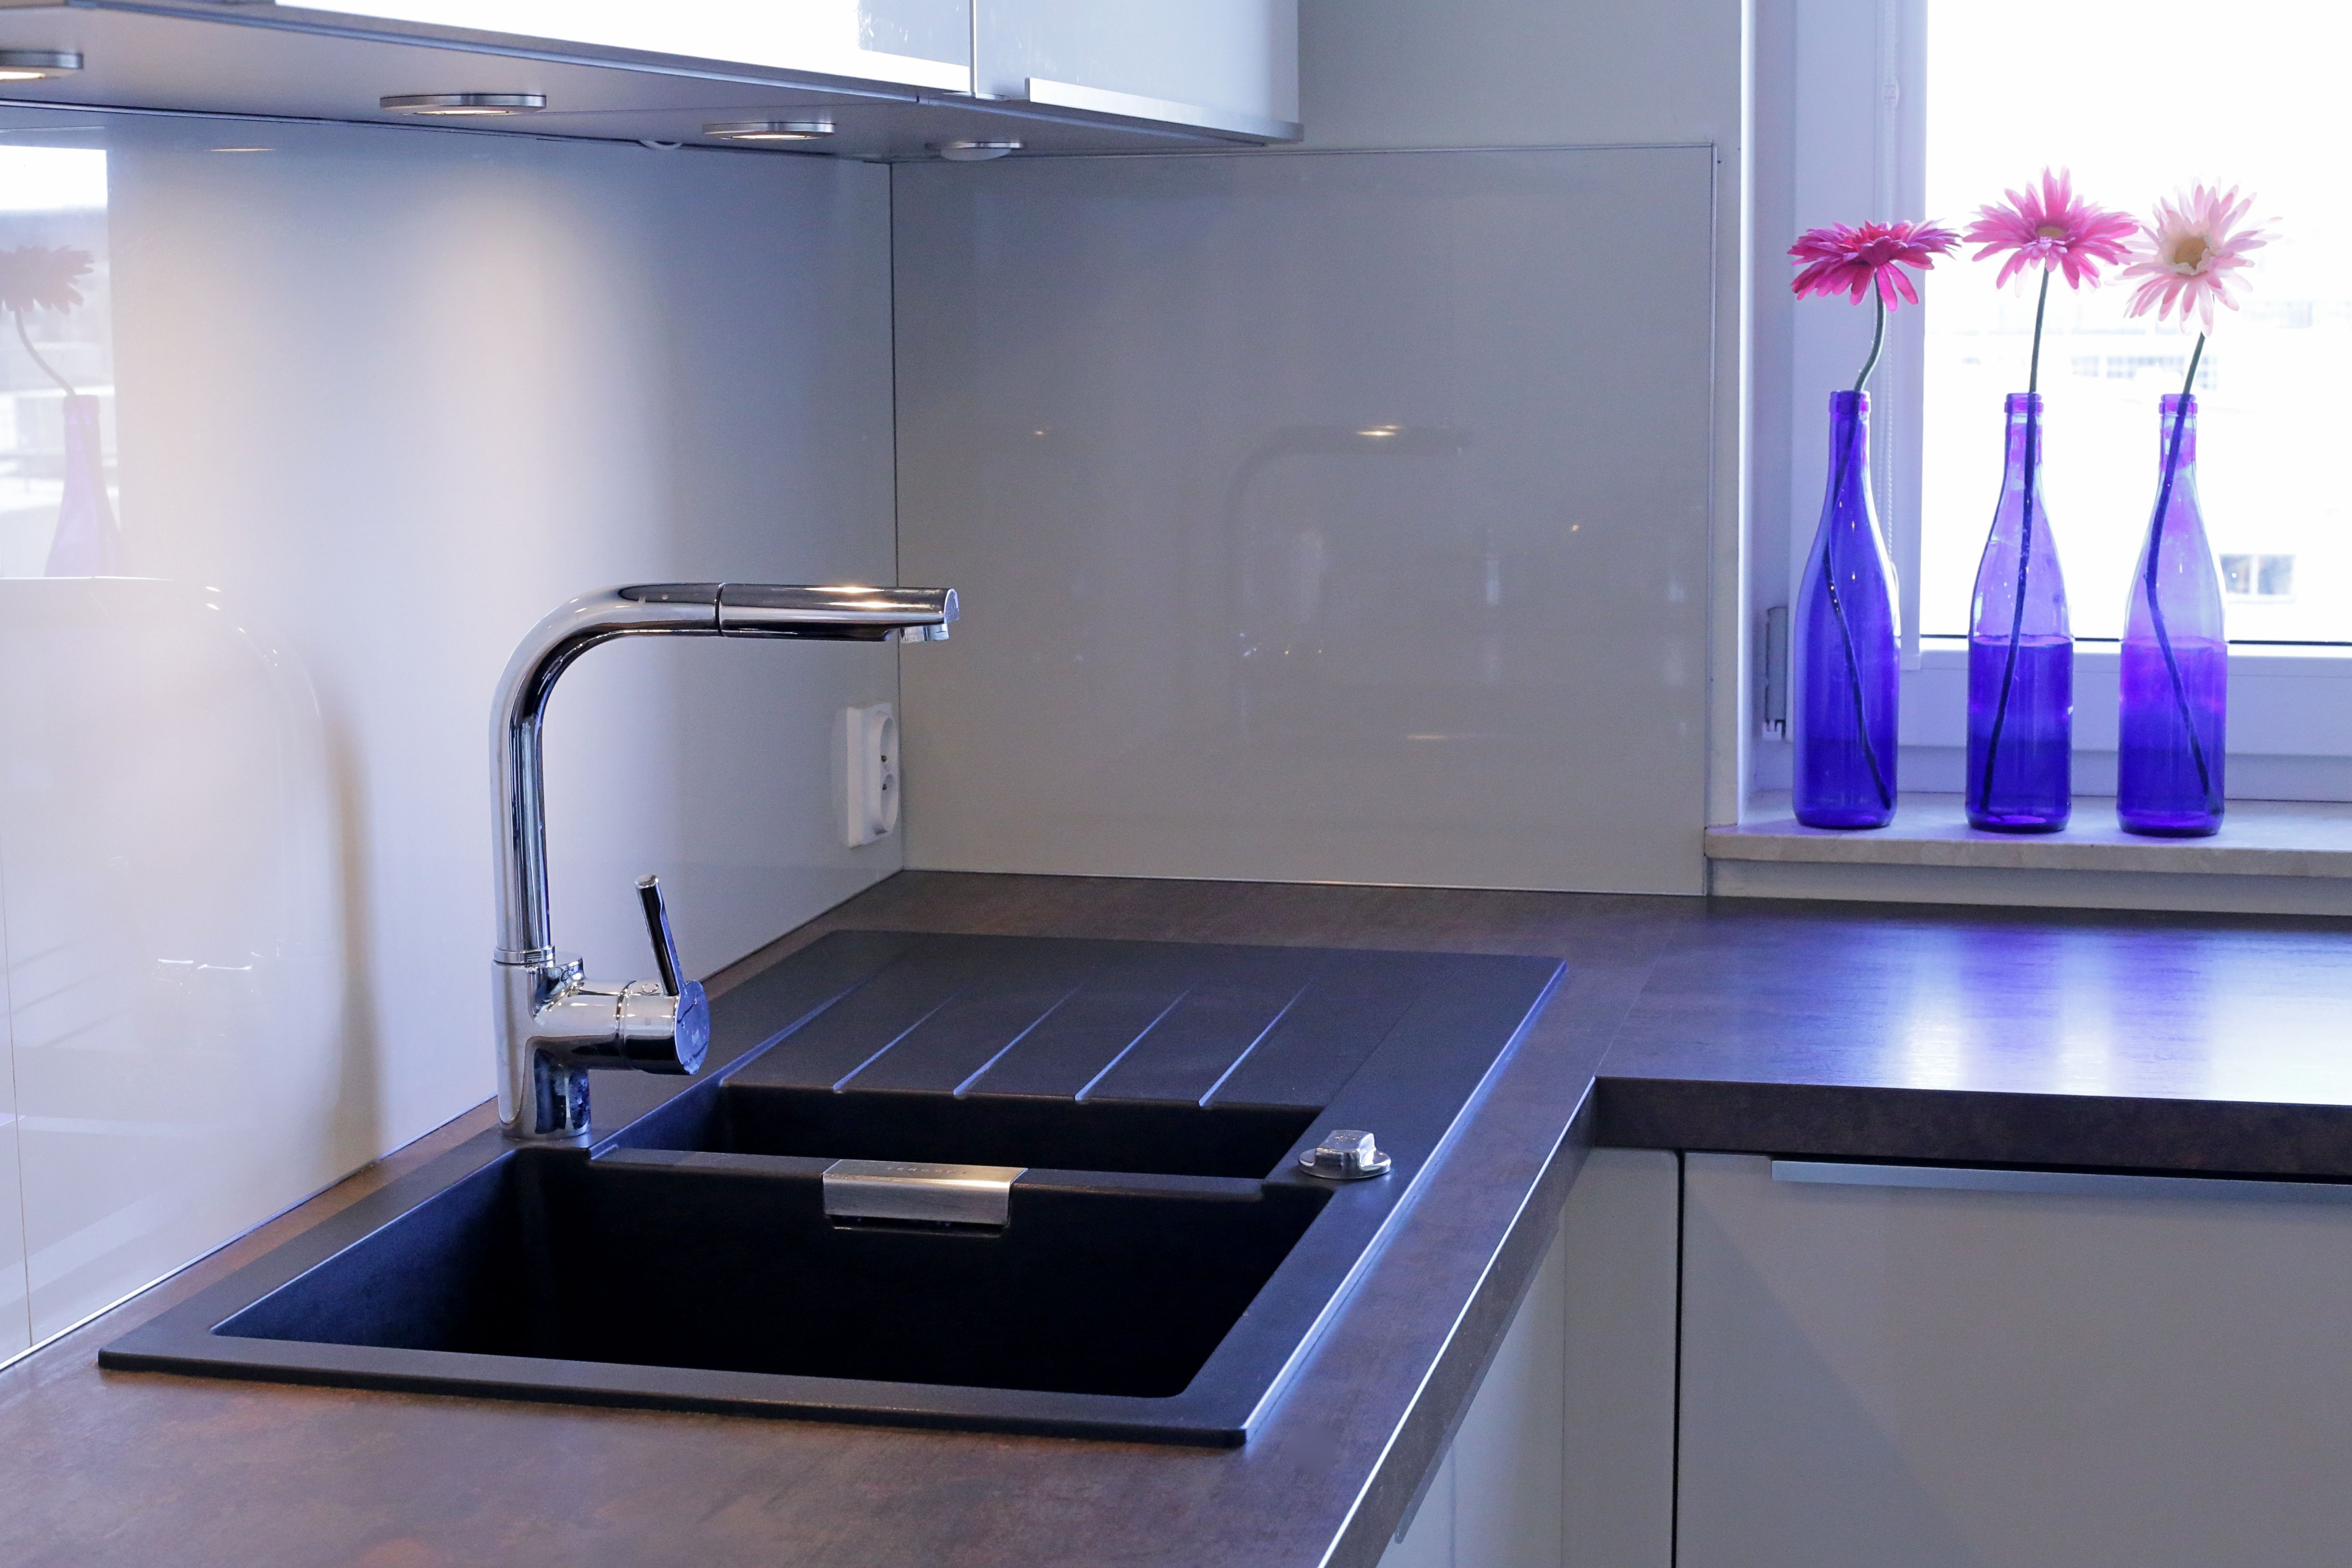 Schock De schock sinks uk stunning schock signus d cristadur kitchen sink u